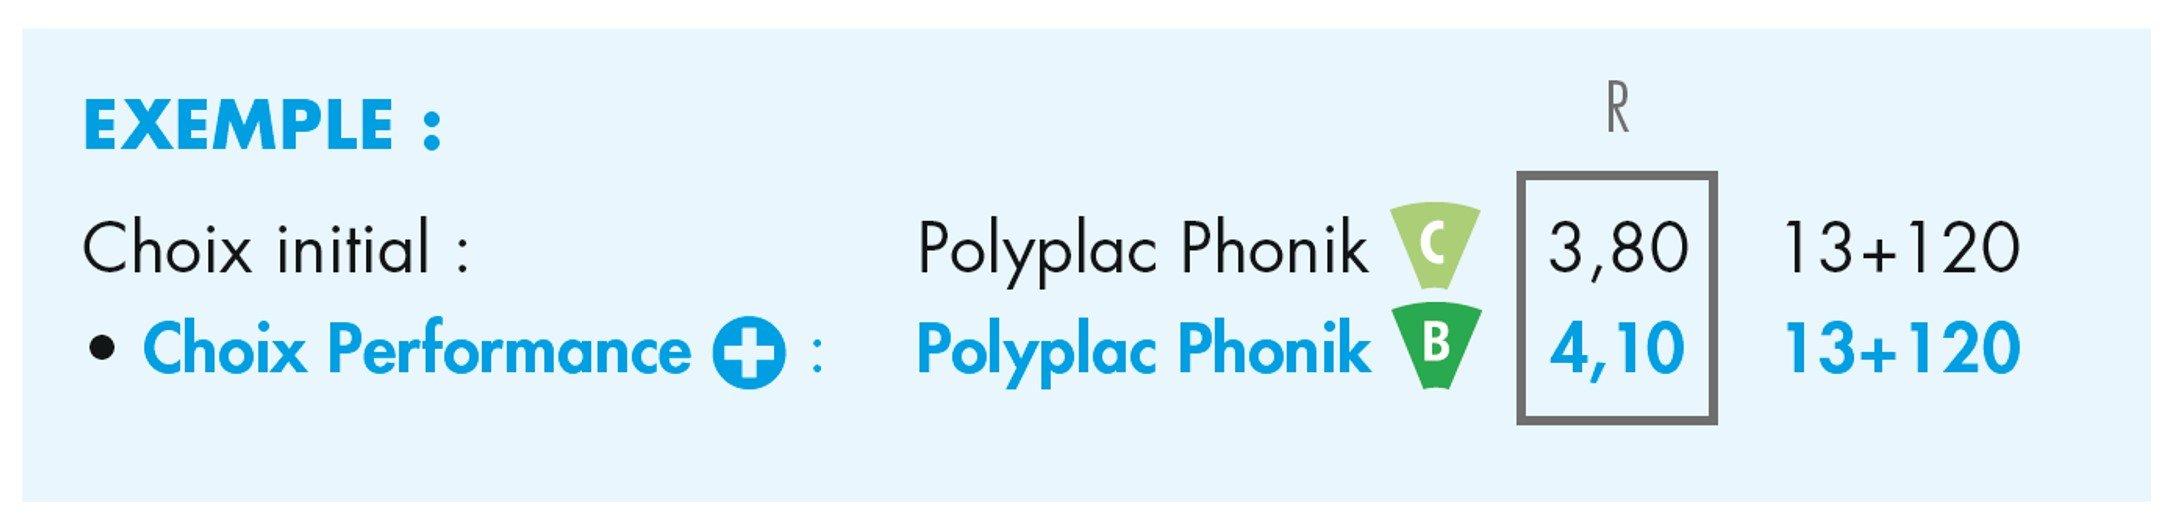 knauf_polyplac_phonik_classe supérieur2